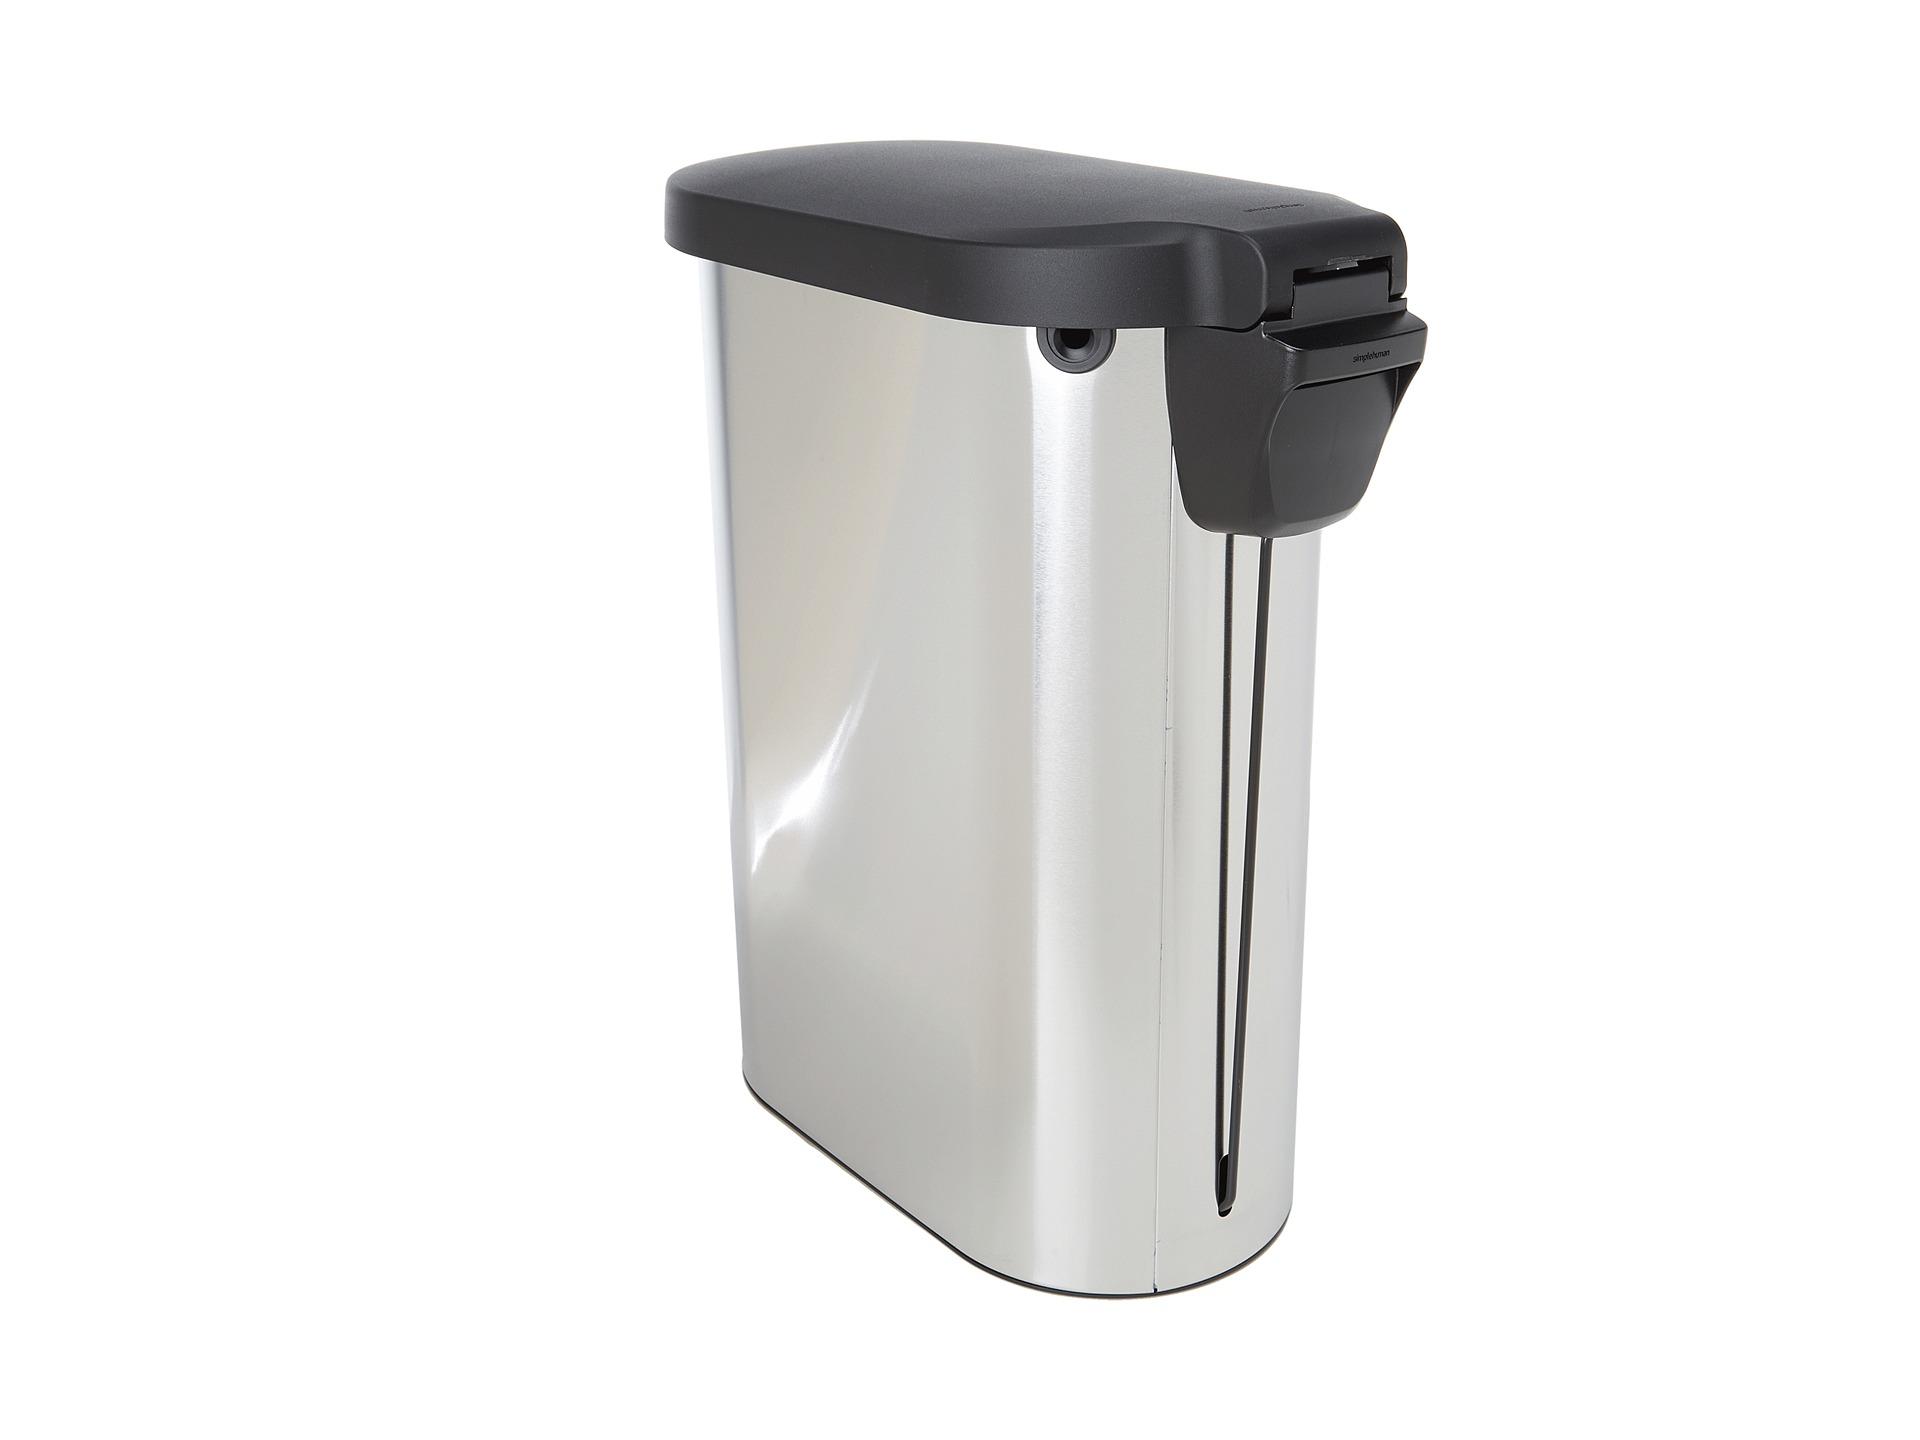 simplehuman 45l slim step trash can w plastic lid fingerprint proof shipped free at zappos. Black Bedroom Furniture Sets. Home Design Ideas